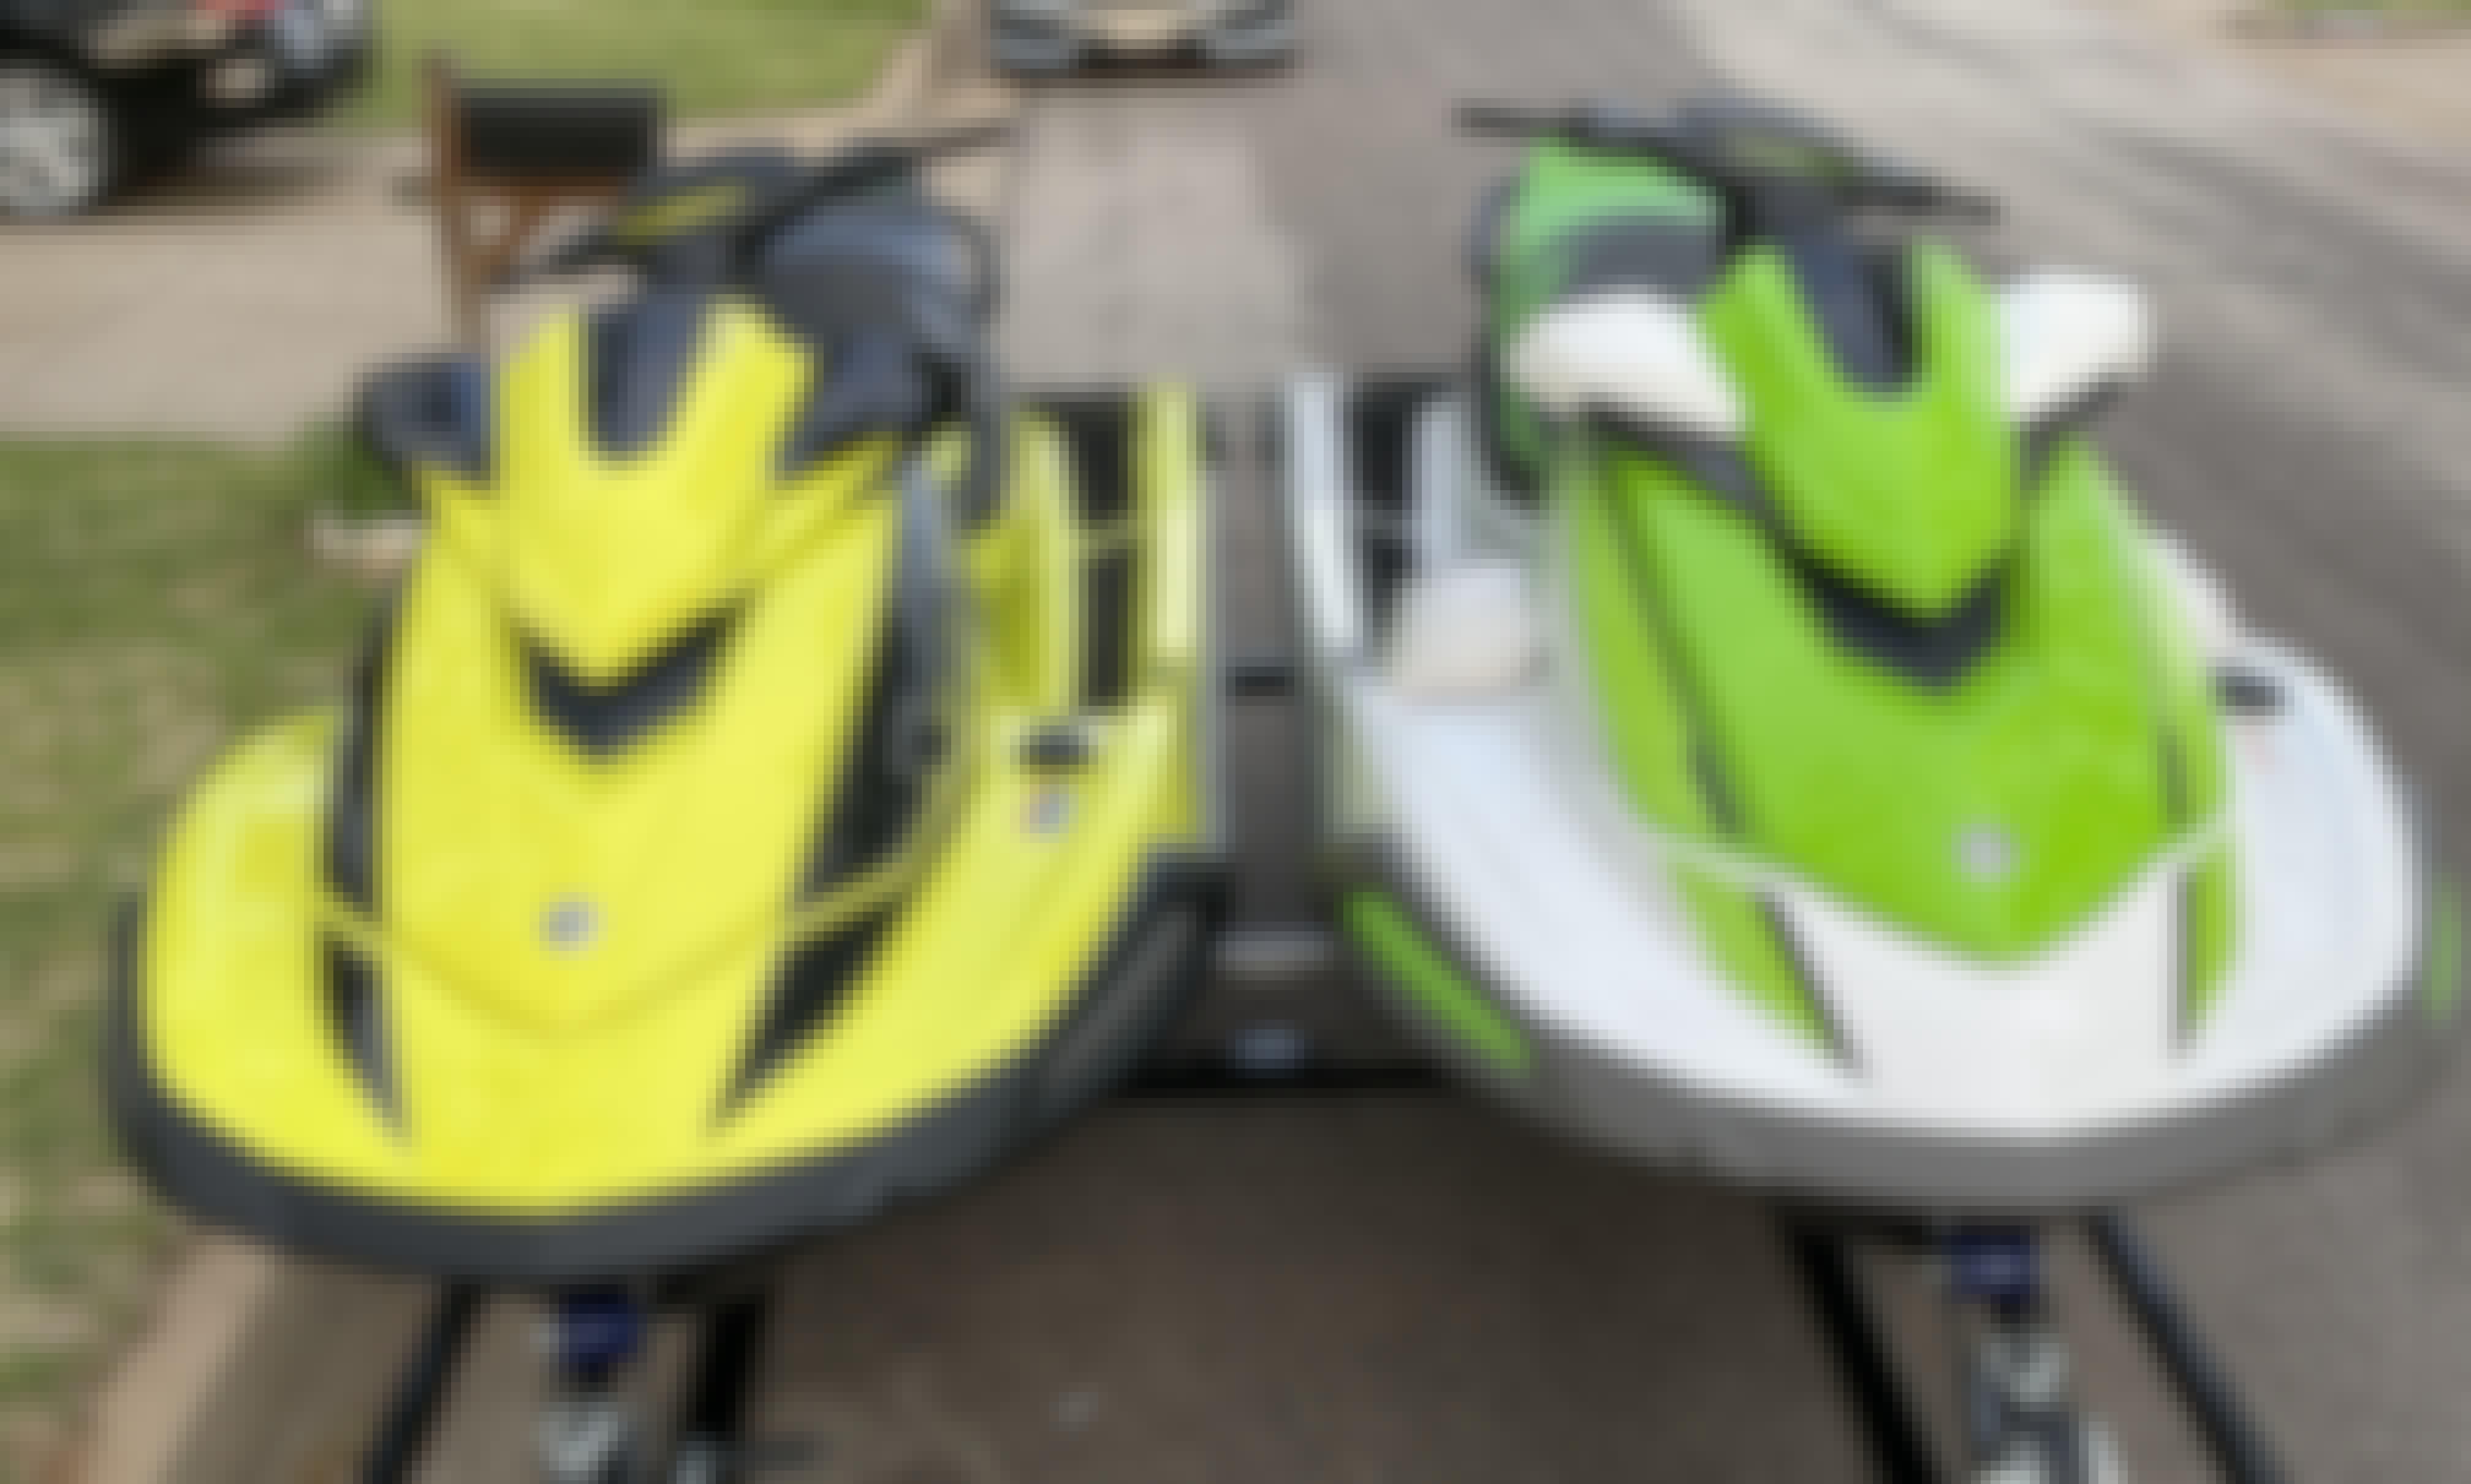 2021 Yamaha Waverunner Jet Skis For Rent x 2 | Ray Roberts Lake